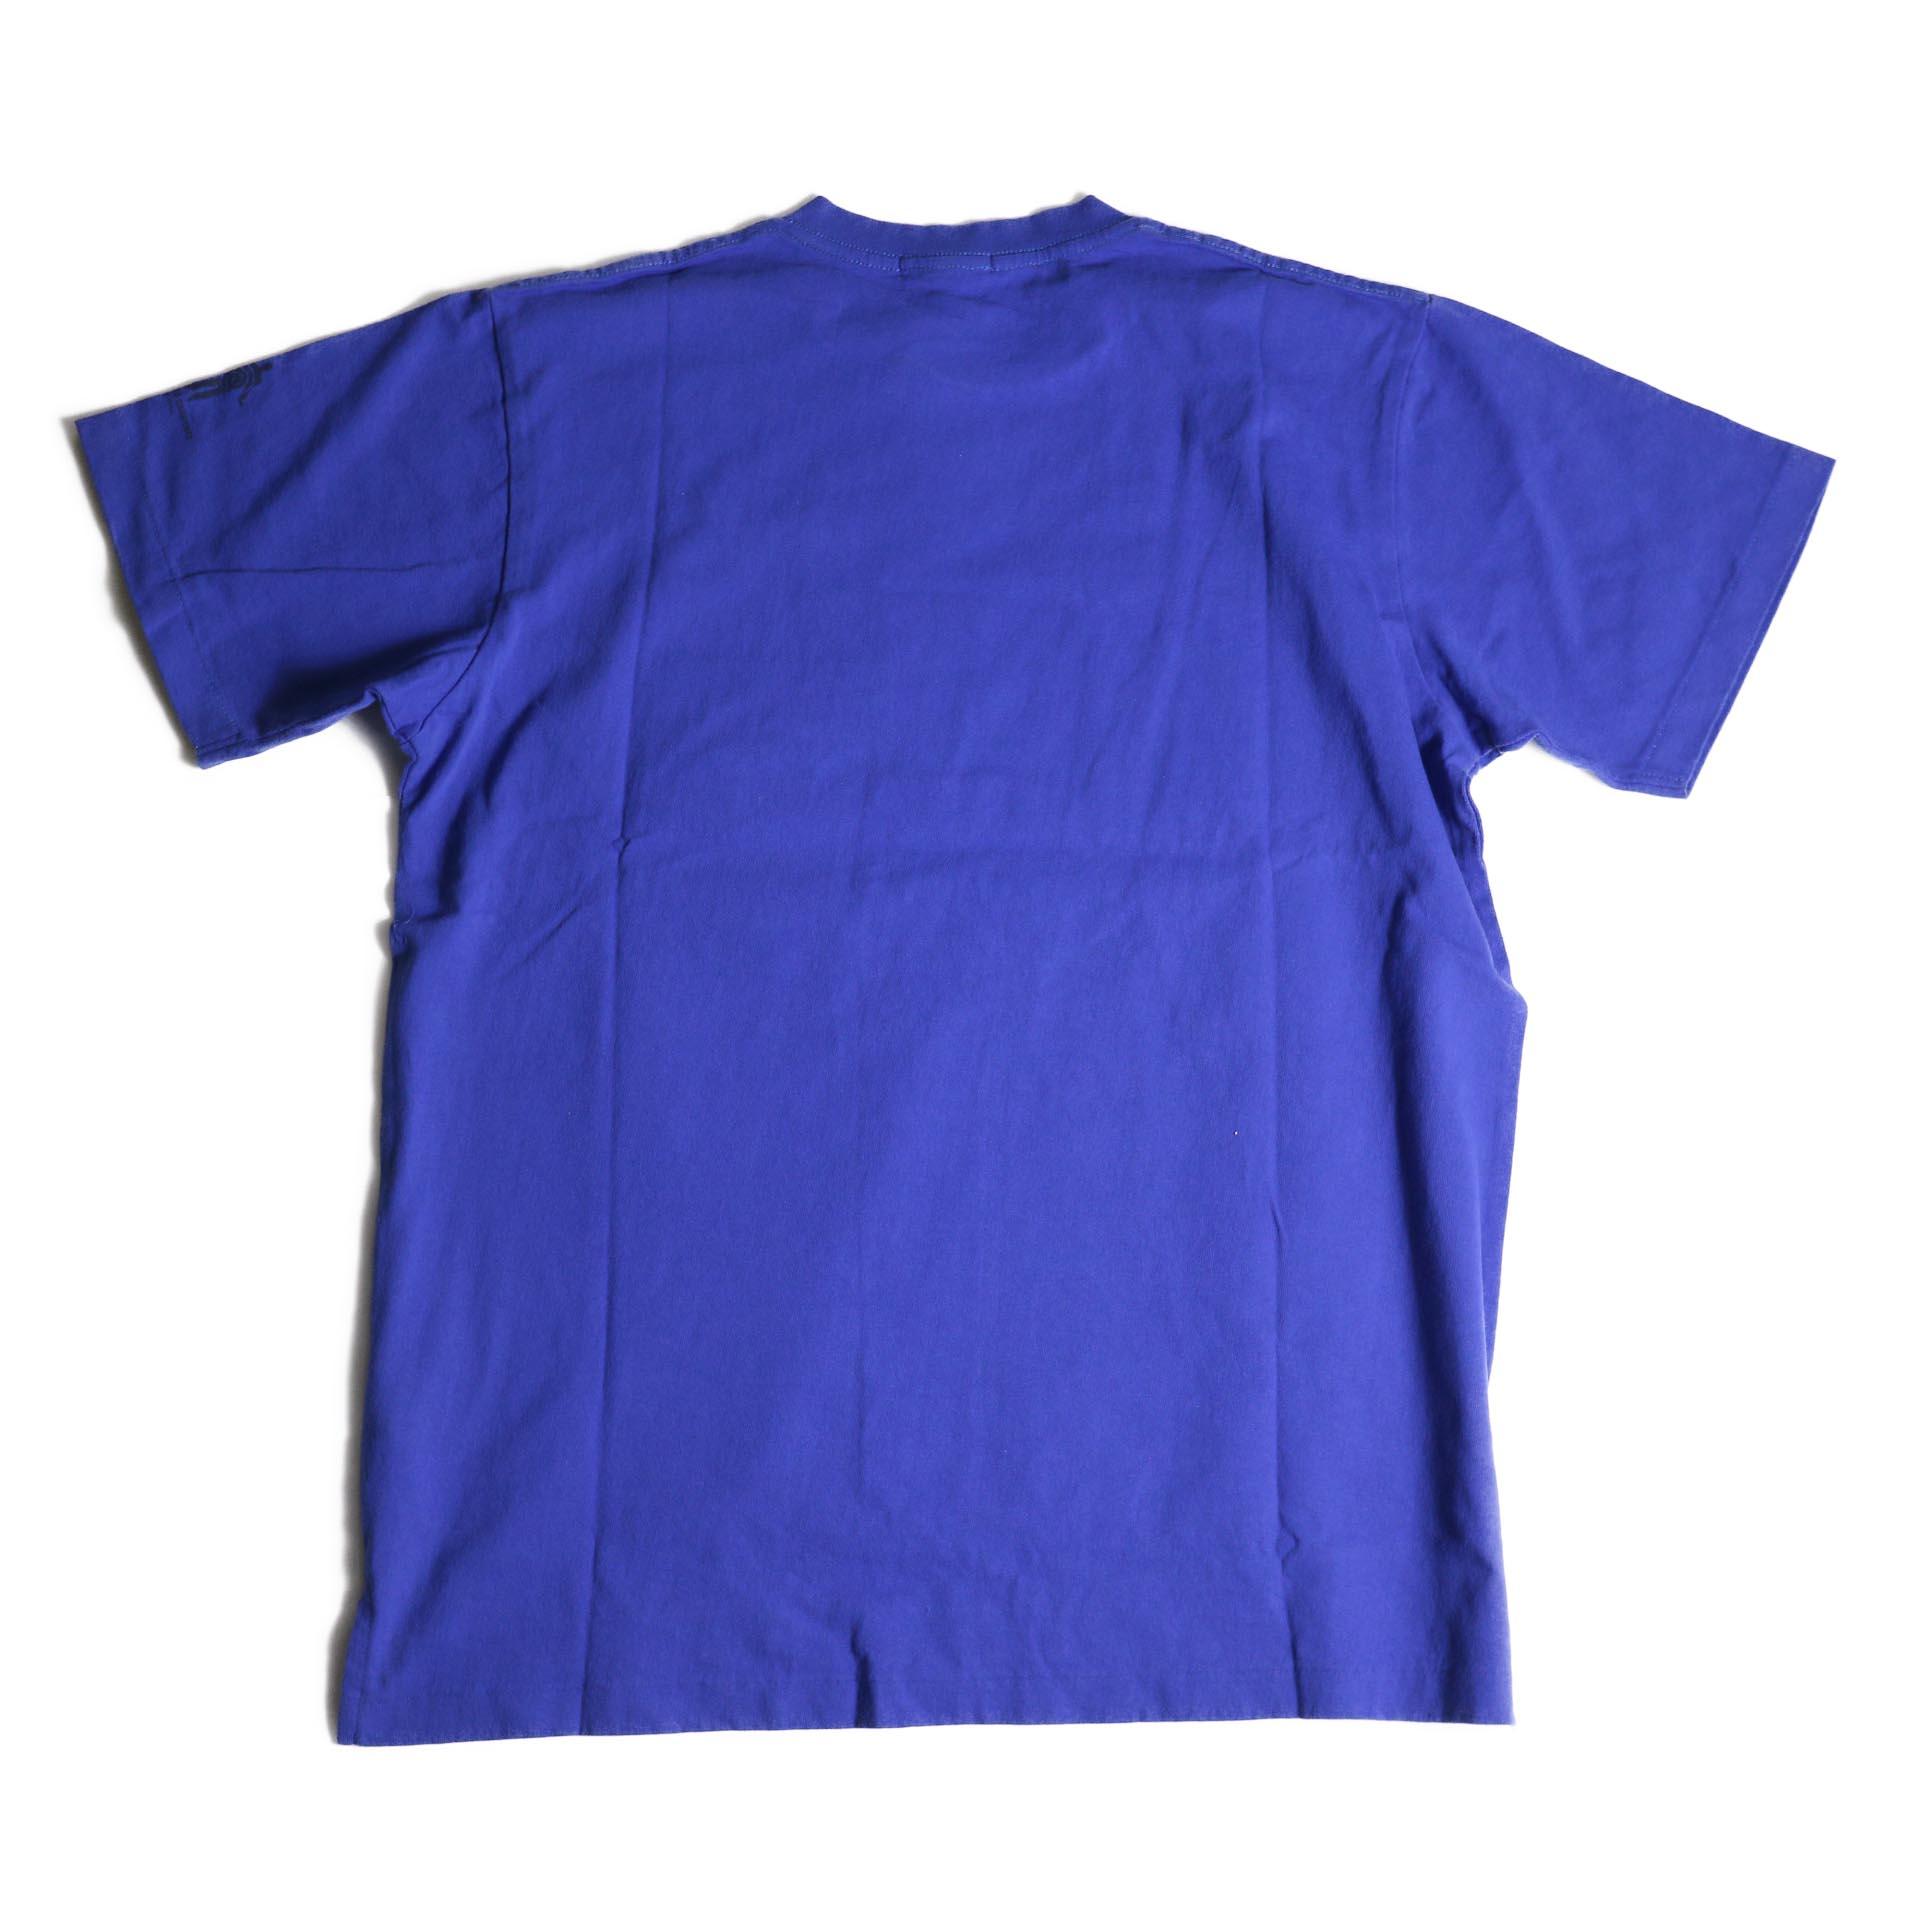 Engineered Garments / Printed Cross Crew Neck T-shirt -Normal (Royal)背面